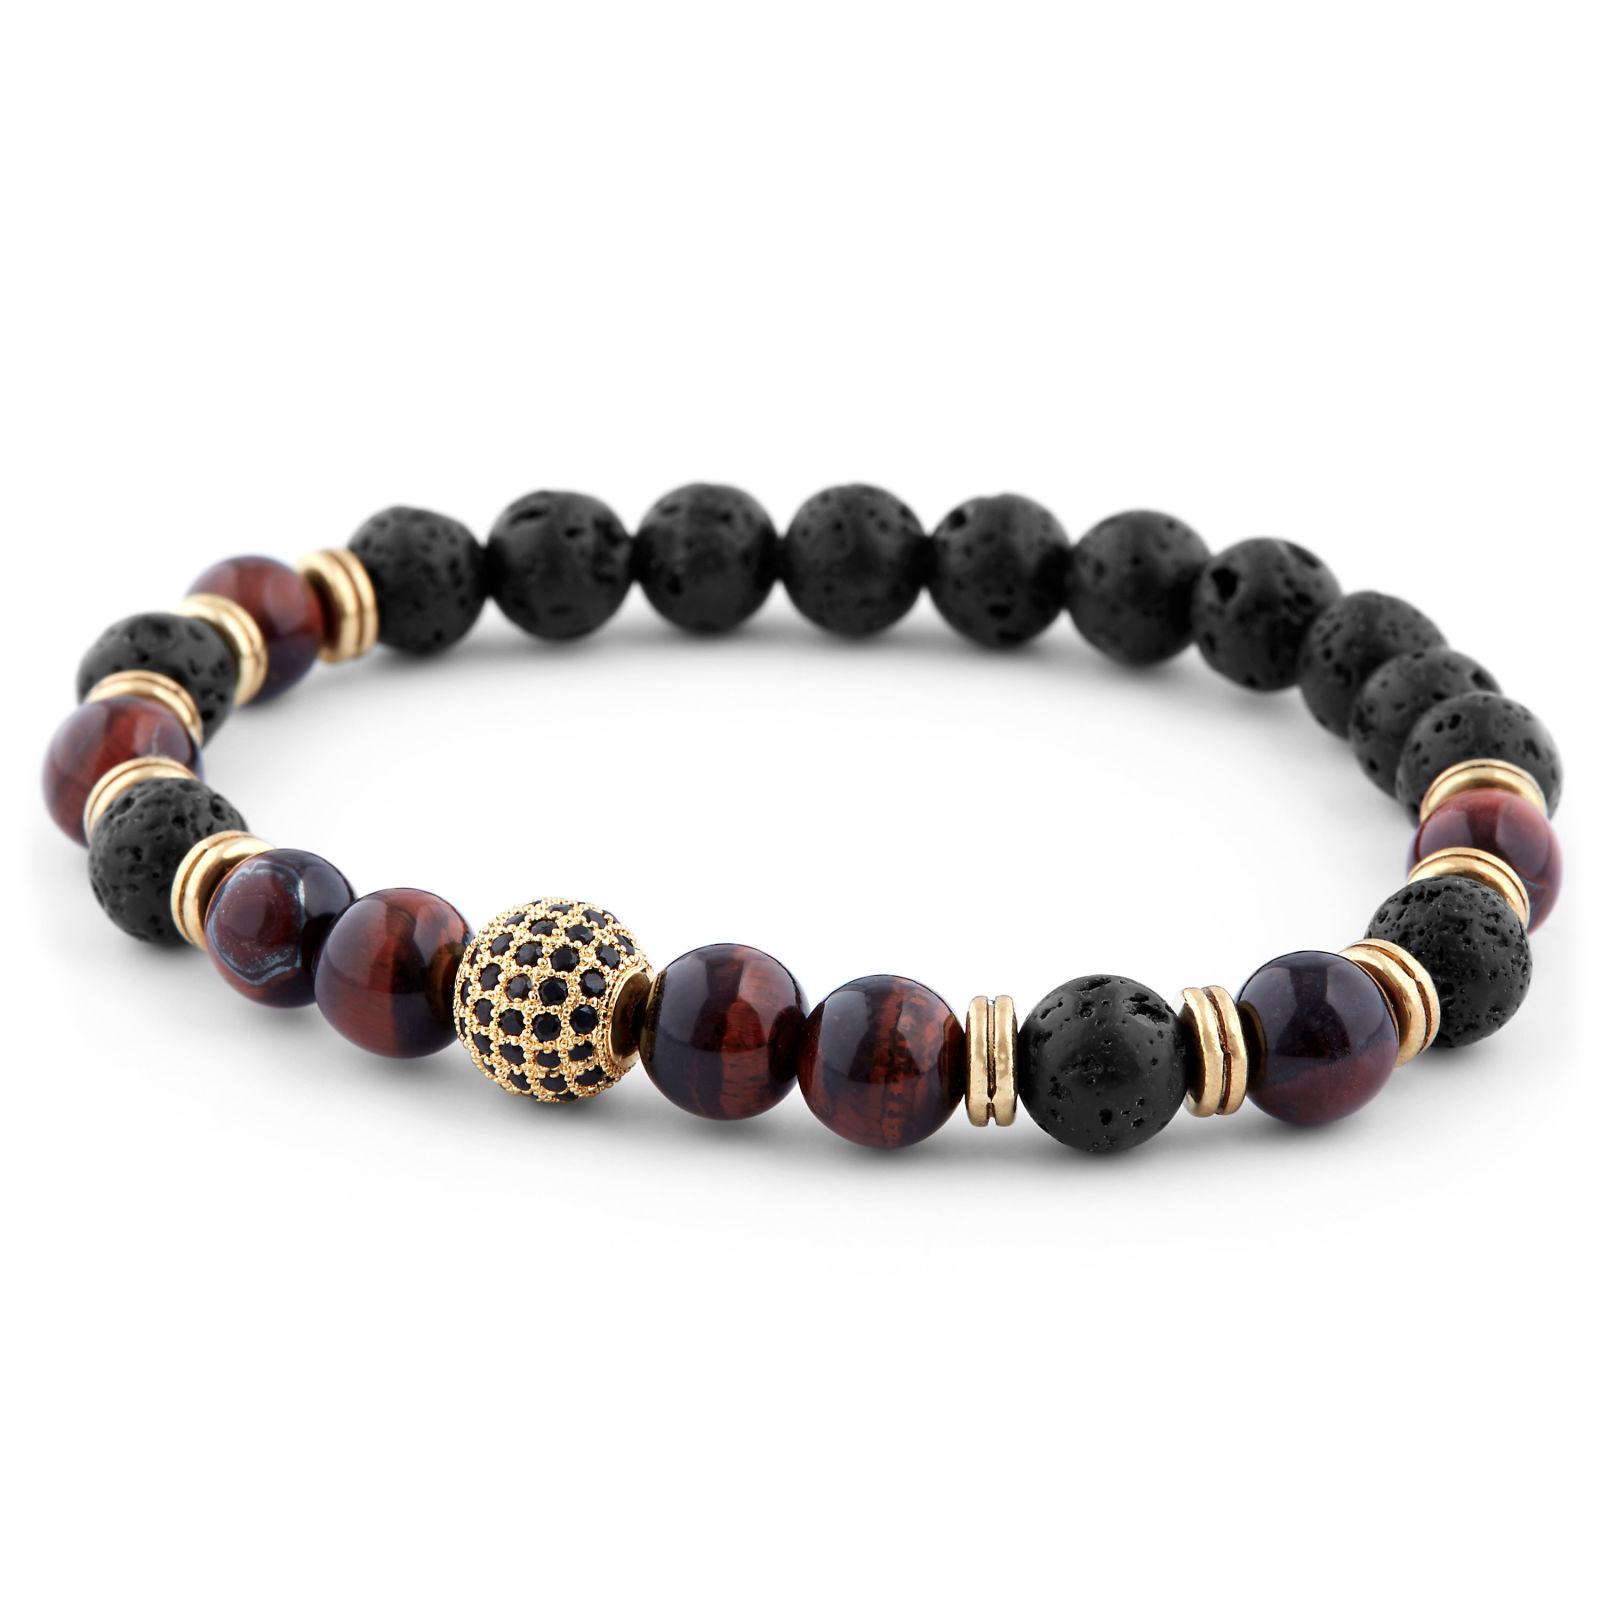 Black Wooden Pearl Necklace Trendhim bvDWS